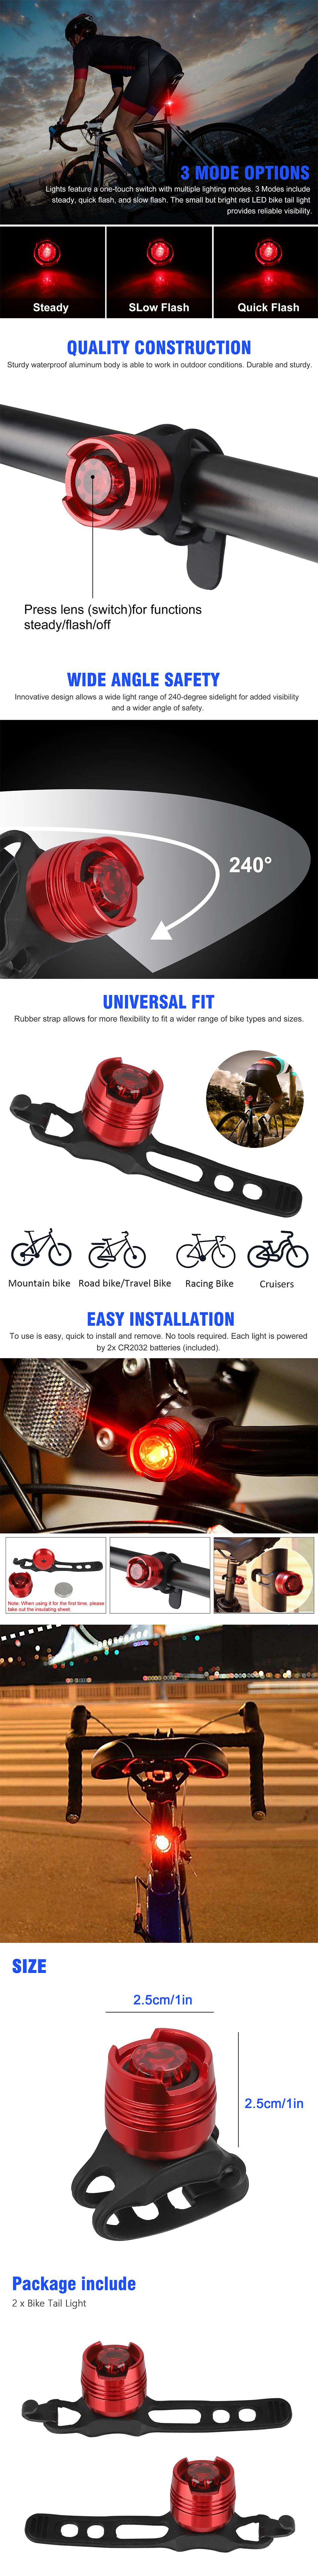 3 Mode Bike Tail Light Bicycle LED Safety Rear Lamp Flashing Taillight lot